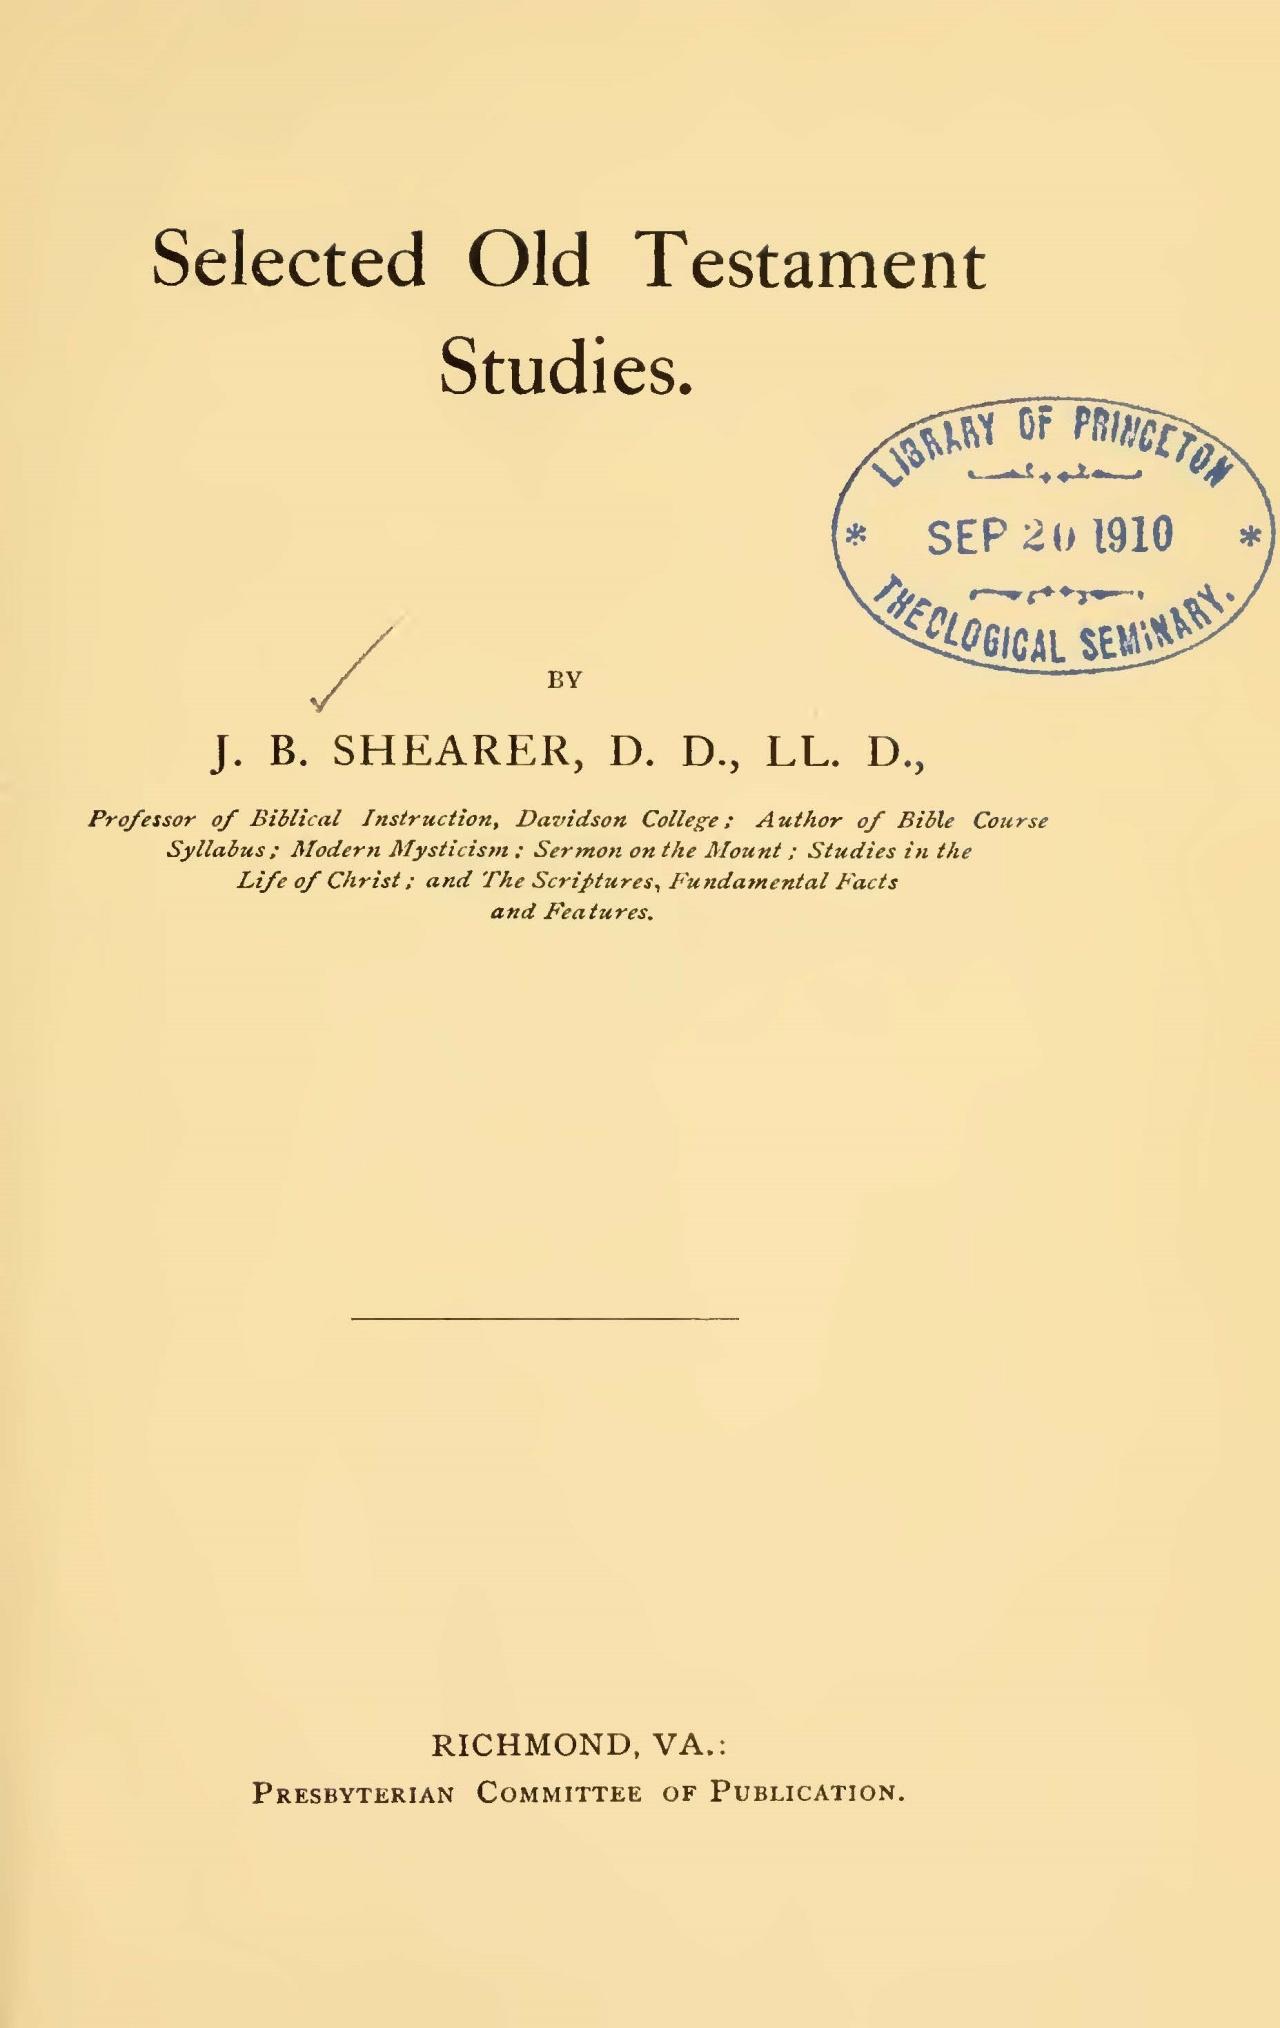 Shearer, John Bunyan, Selected Old Testament Studies Title Page.jpg